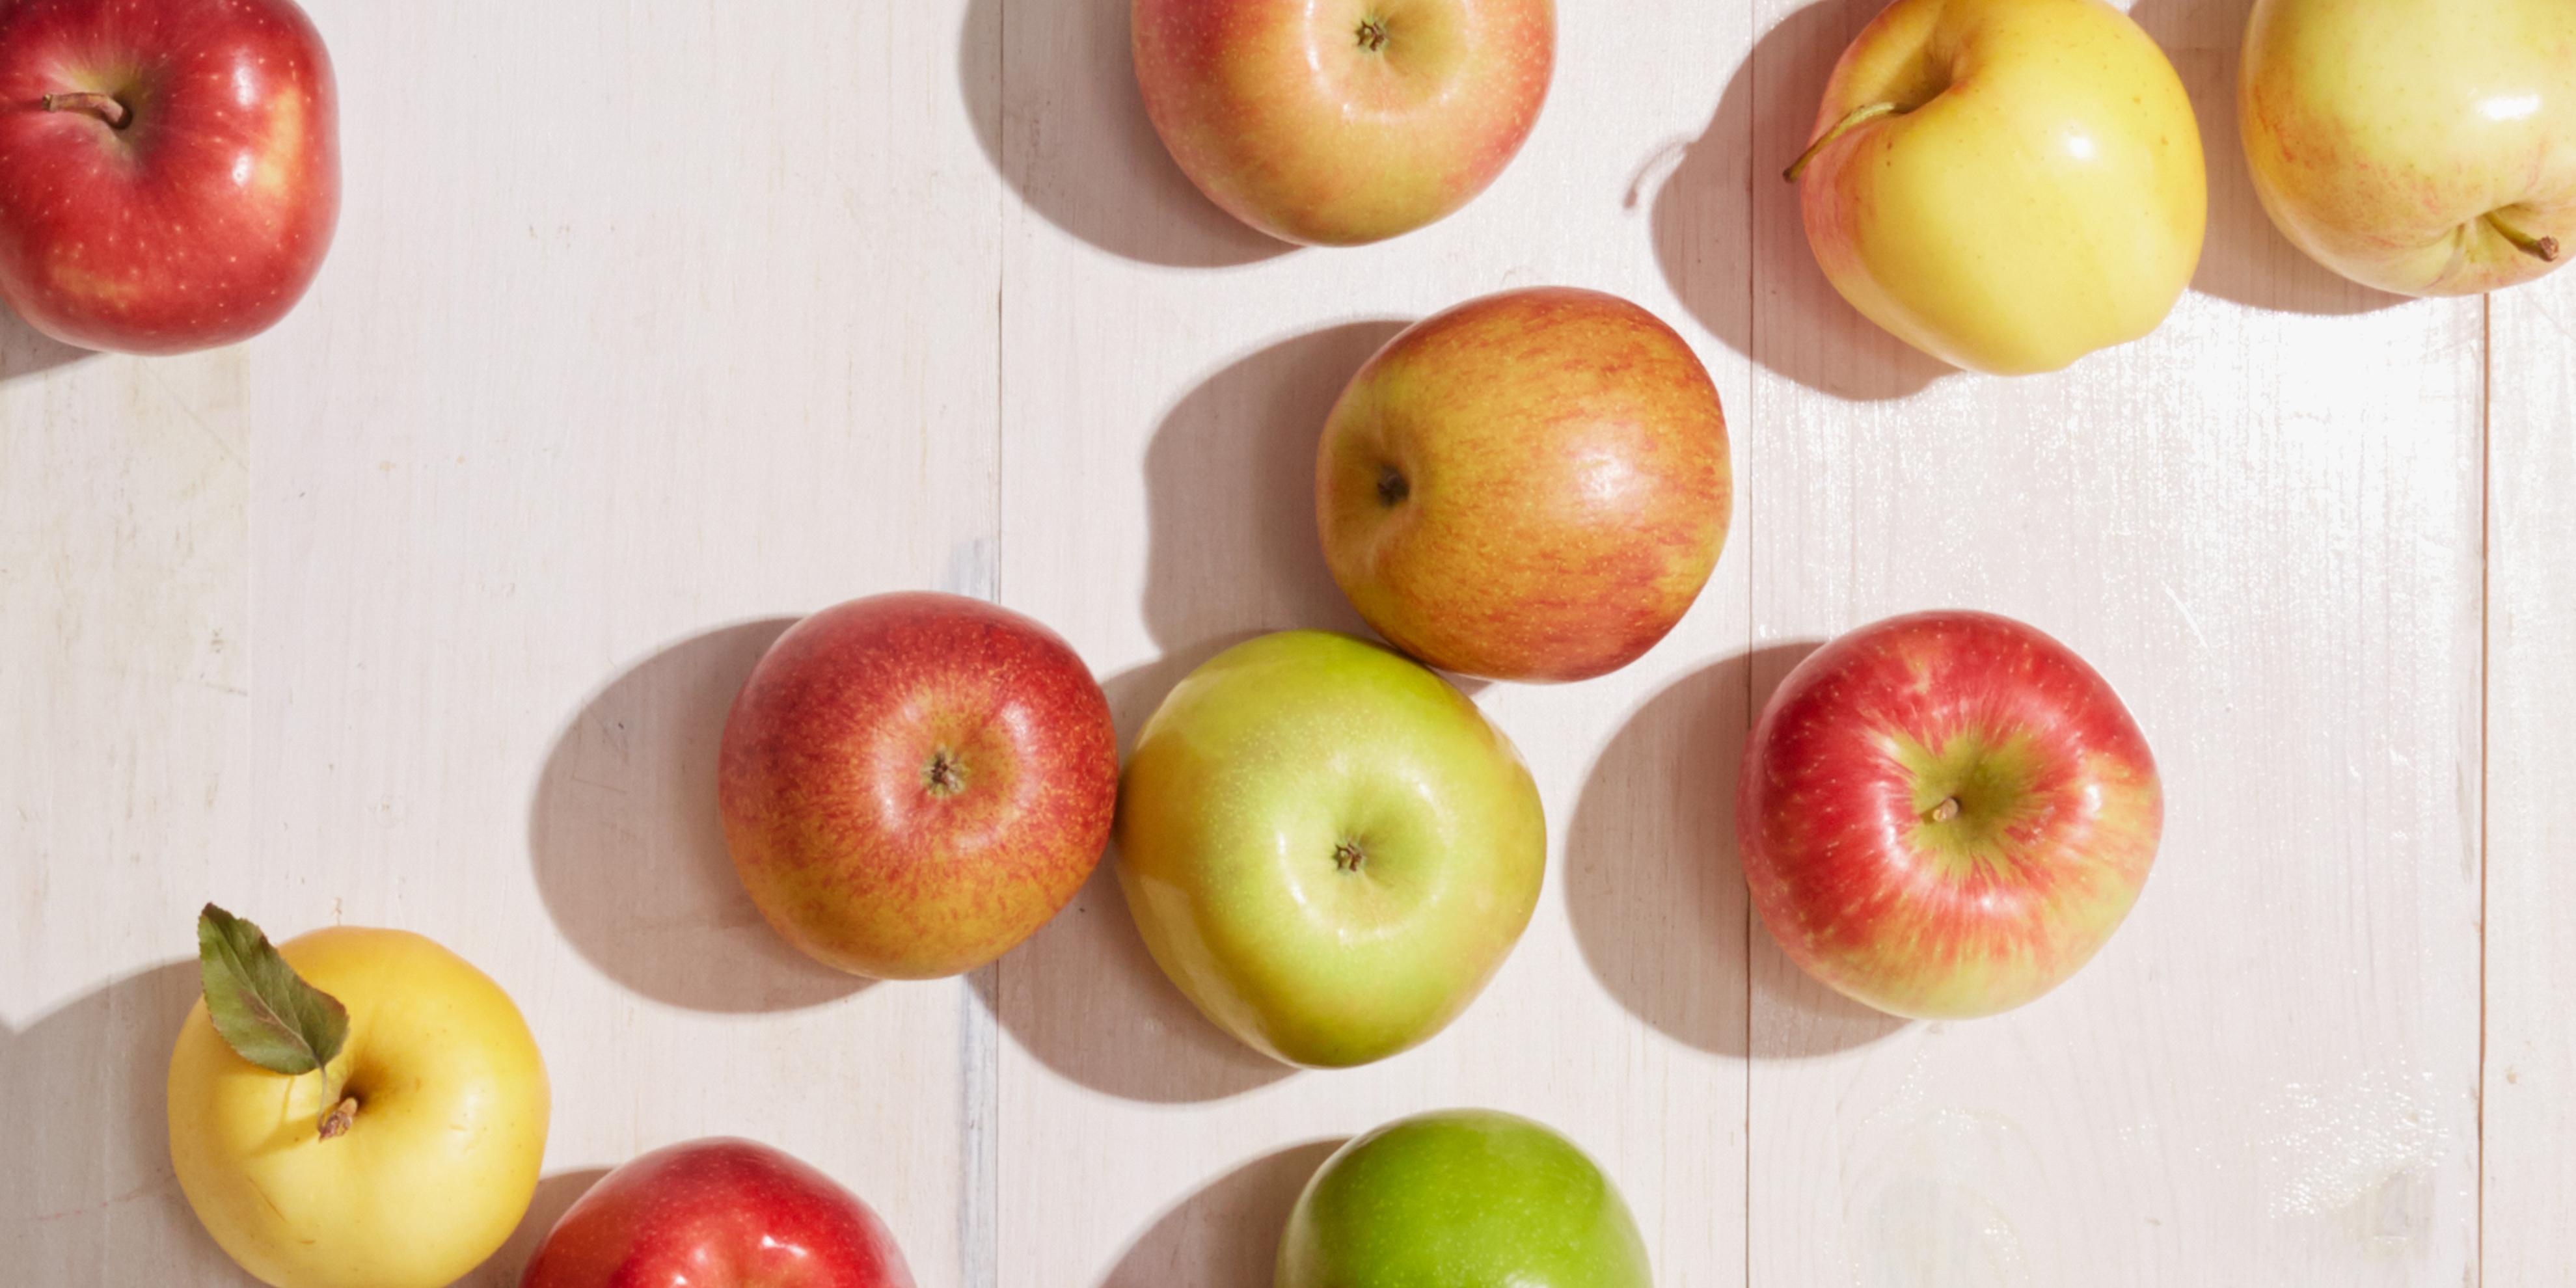 1 Ingredient, 5 Ways: Spotlight on Apples | Blue Apron Blog